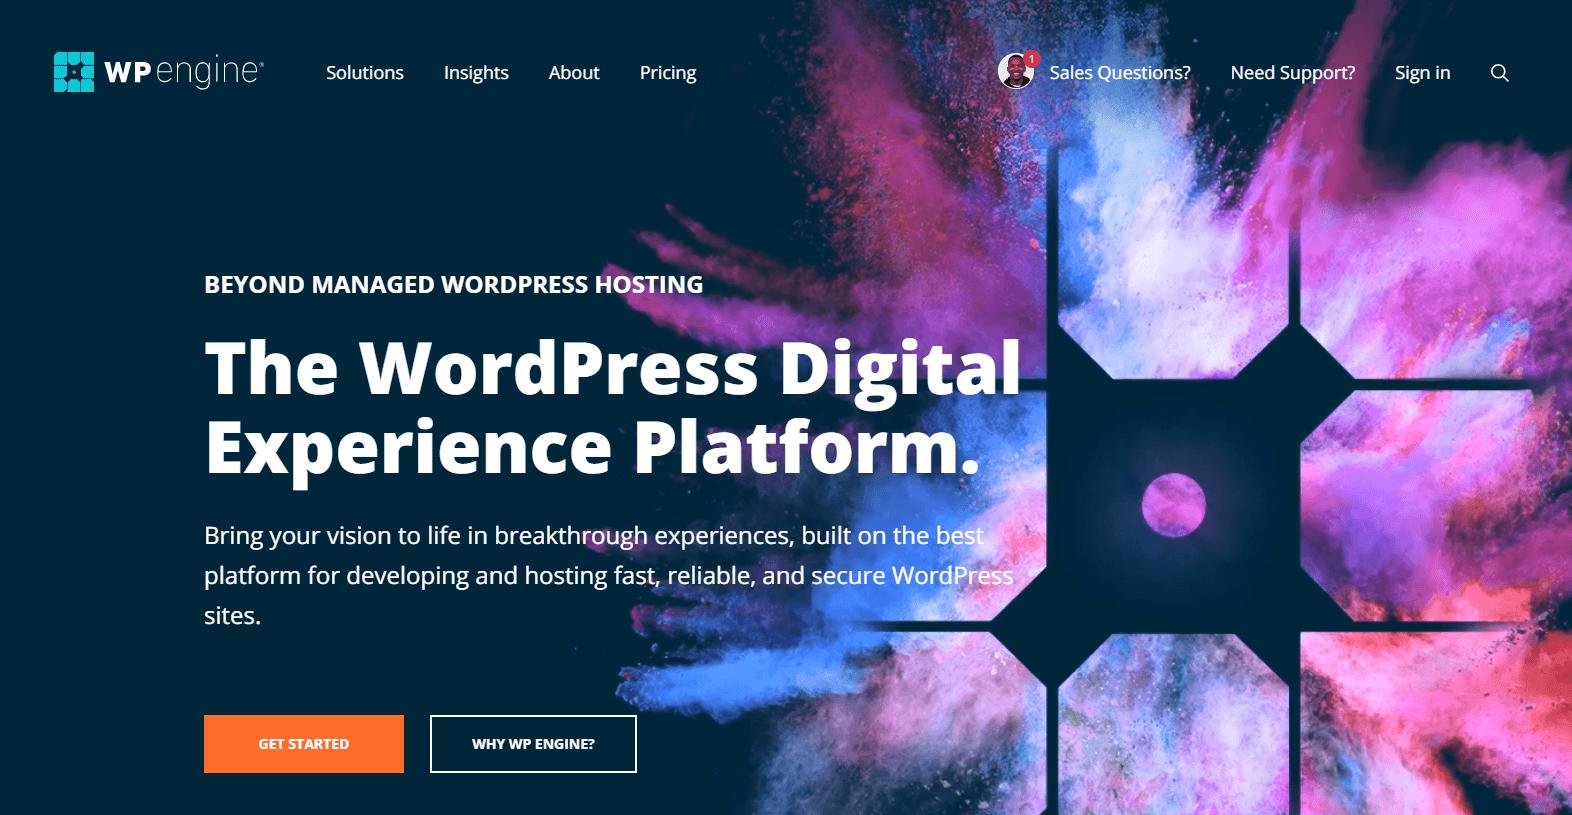 Fastest WordPress hosting: WP Engine